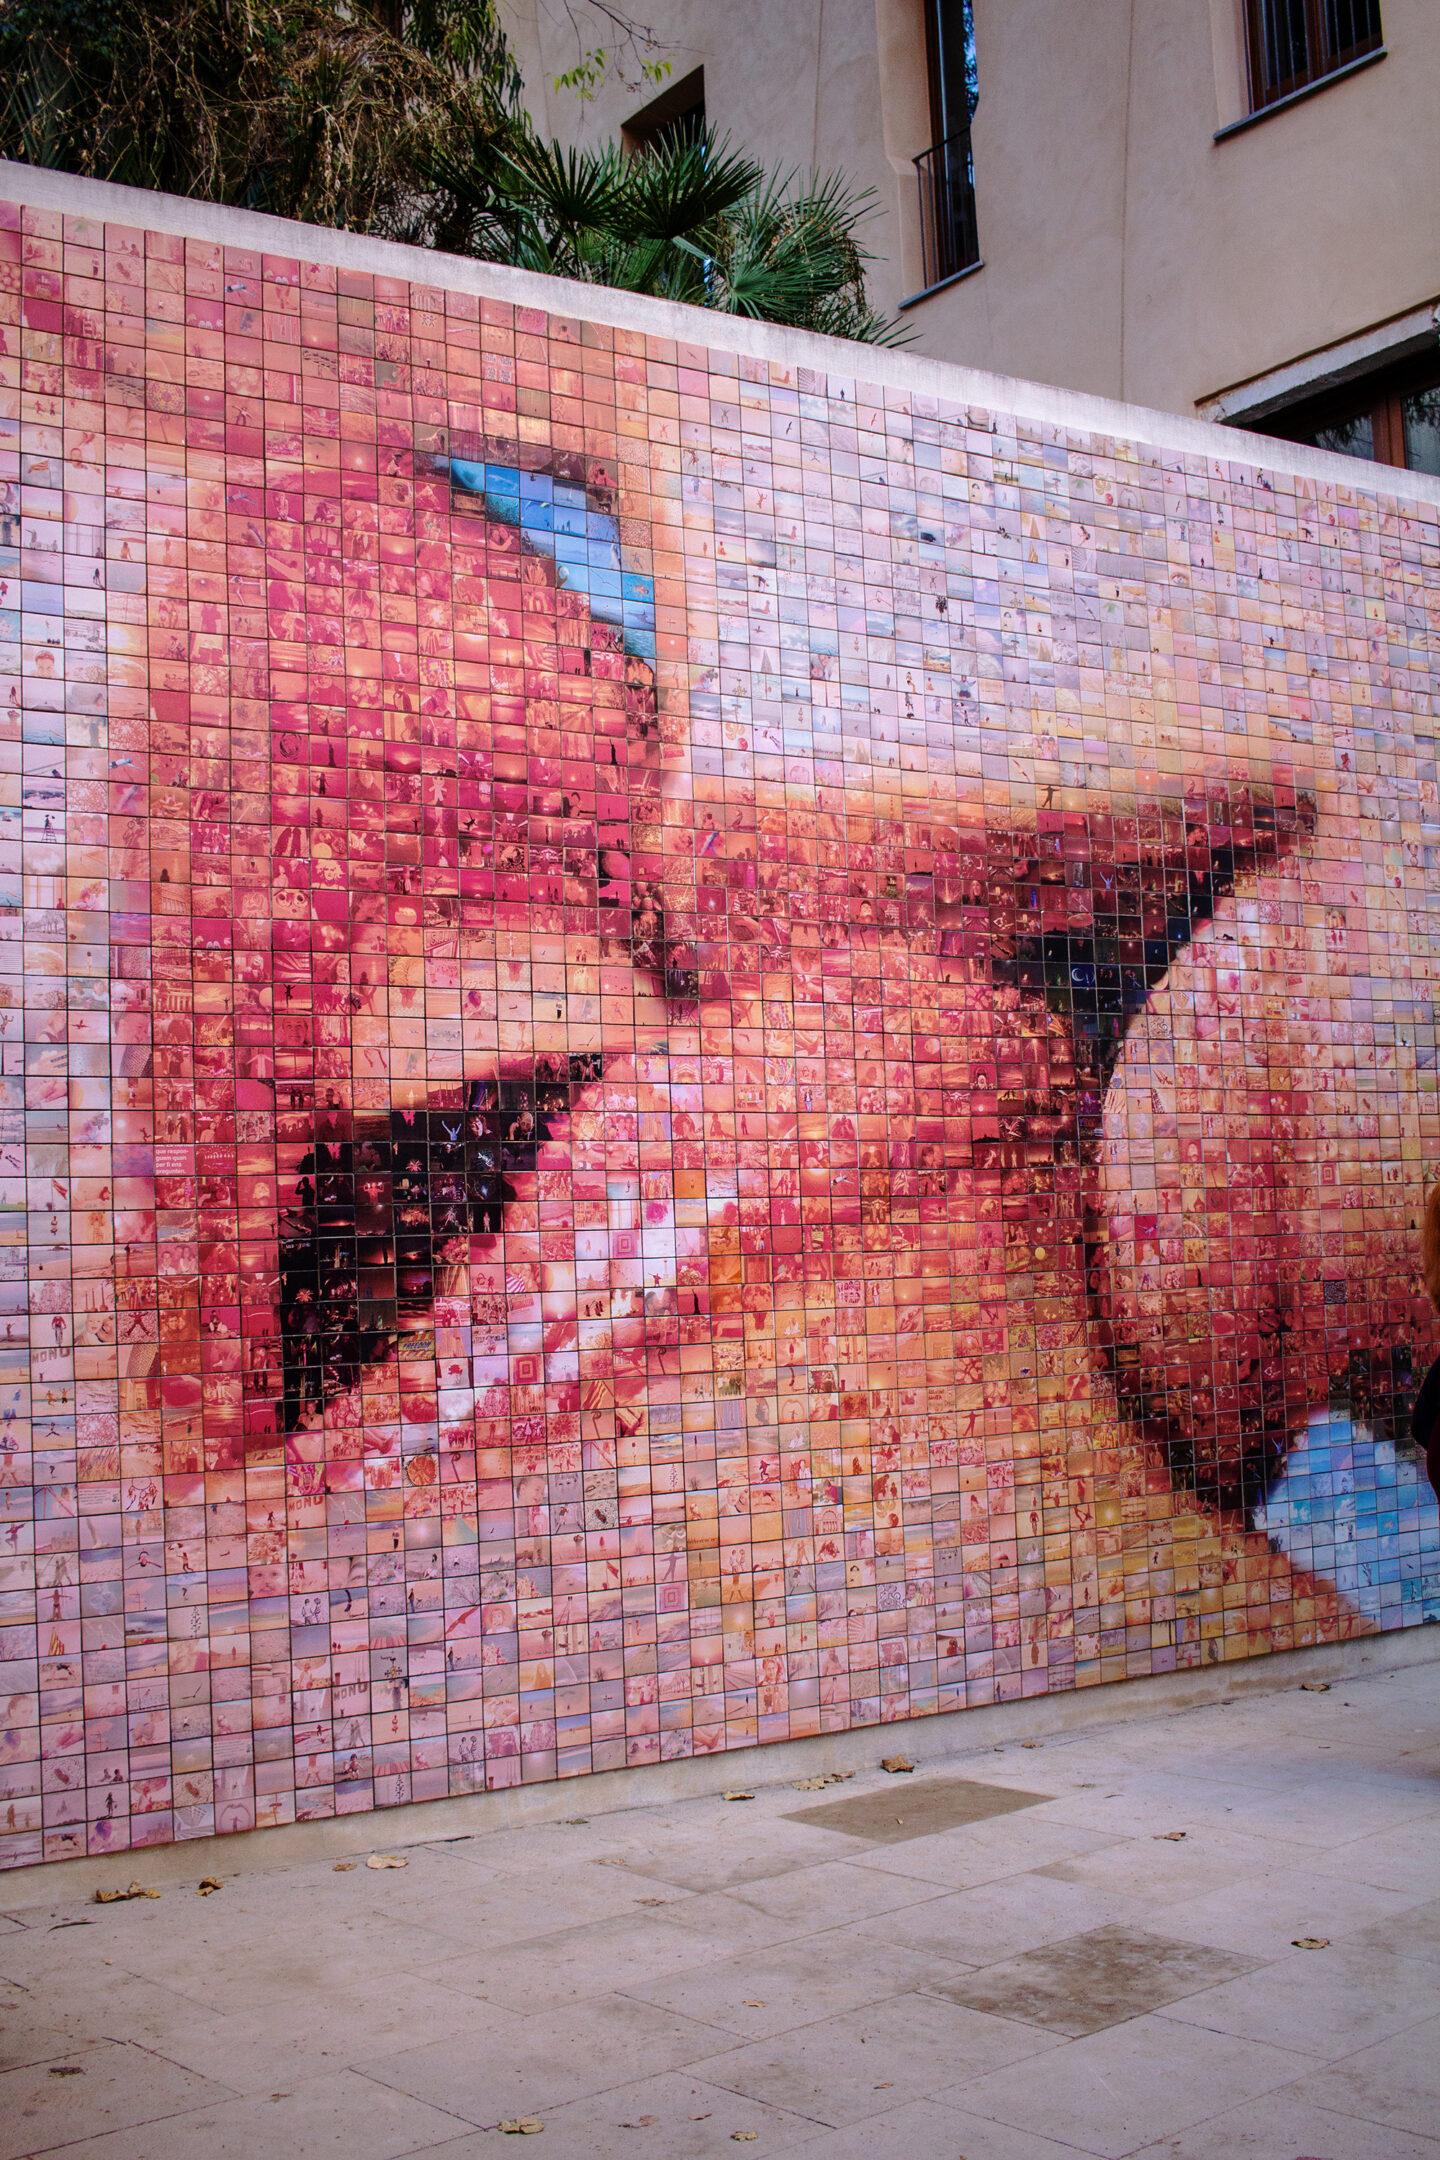 Kissing Lips Street Art in Barcelona